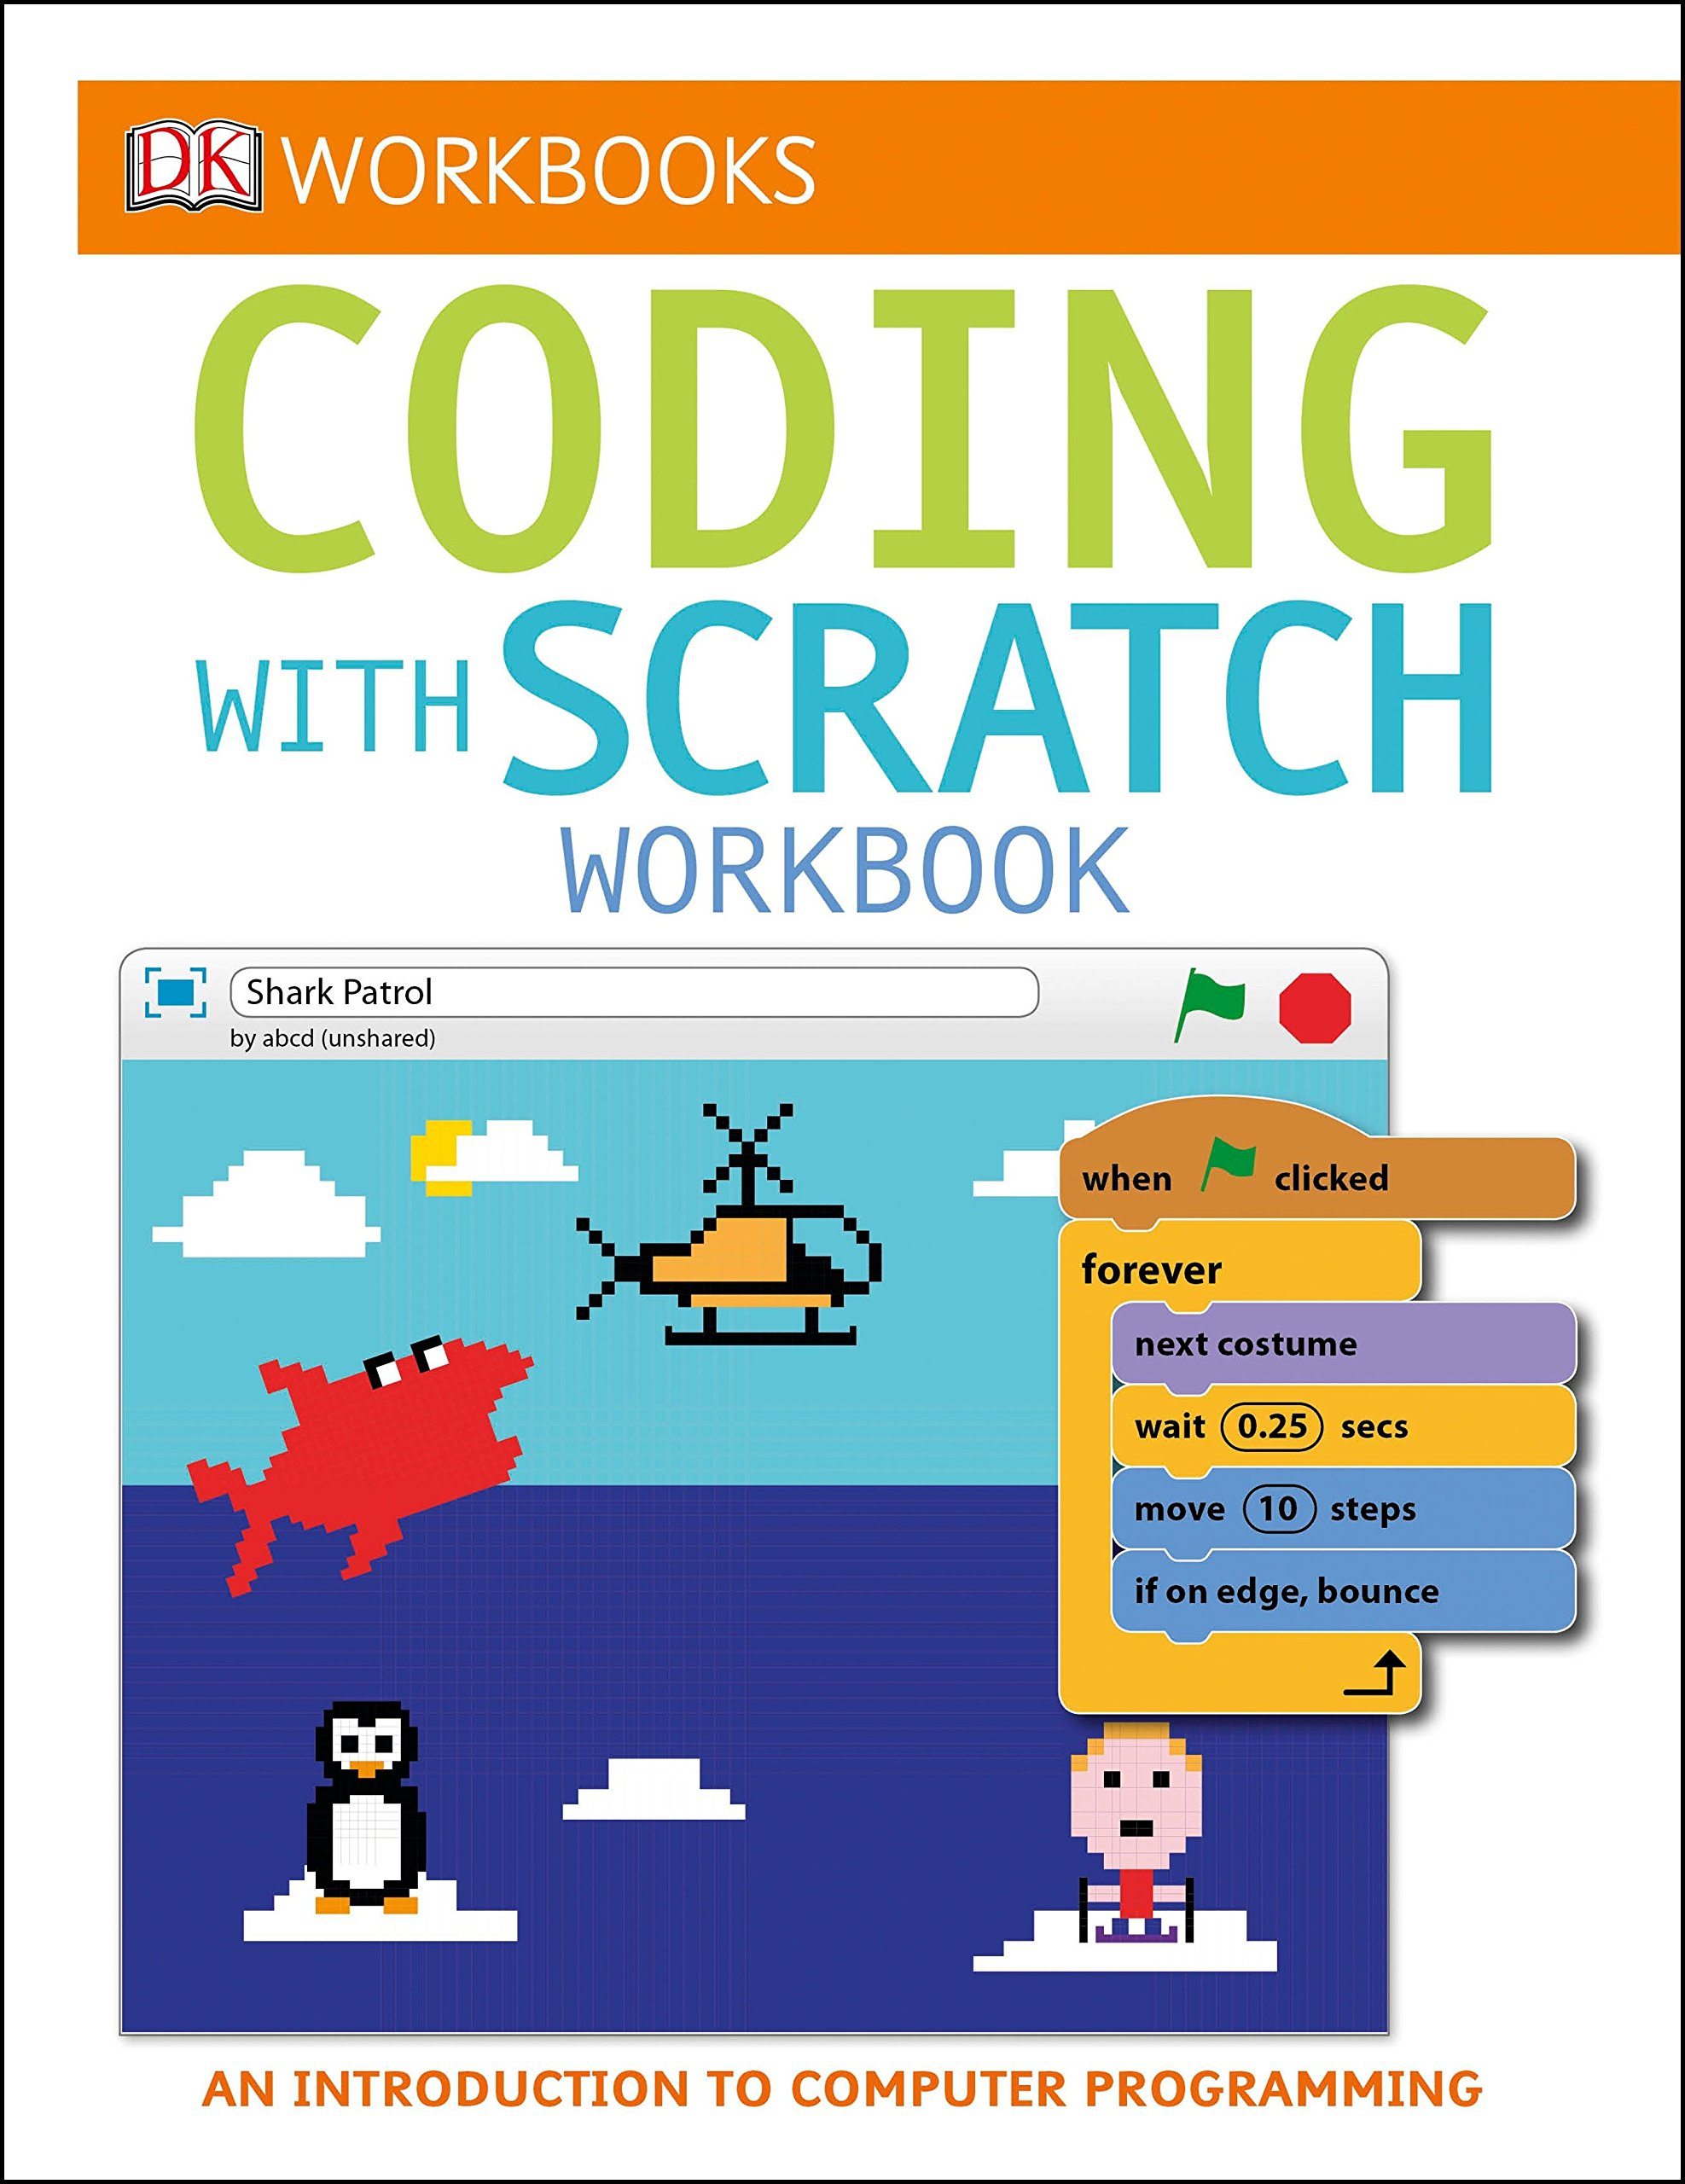 DK Workbooks Coding Scratch Workbook